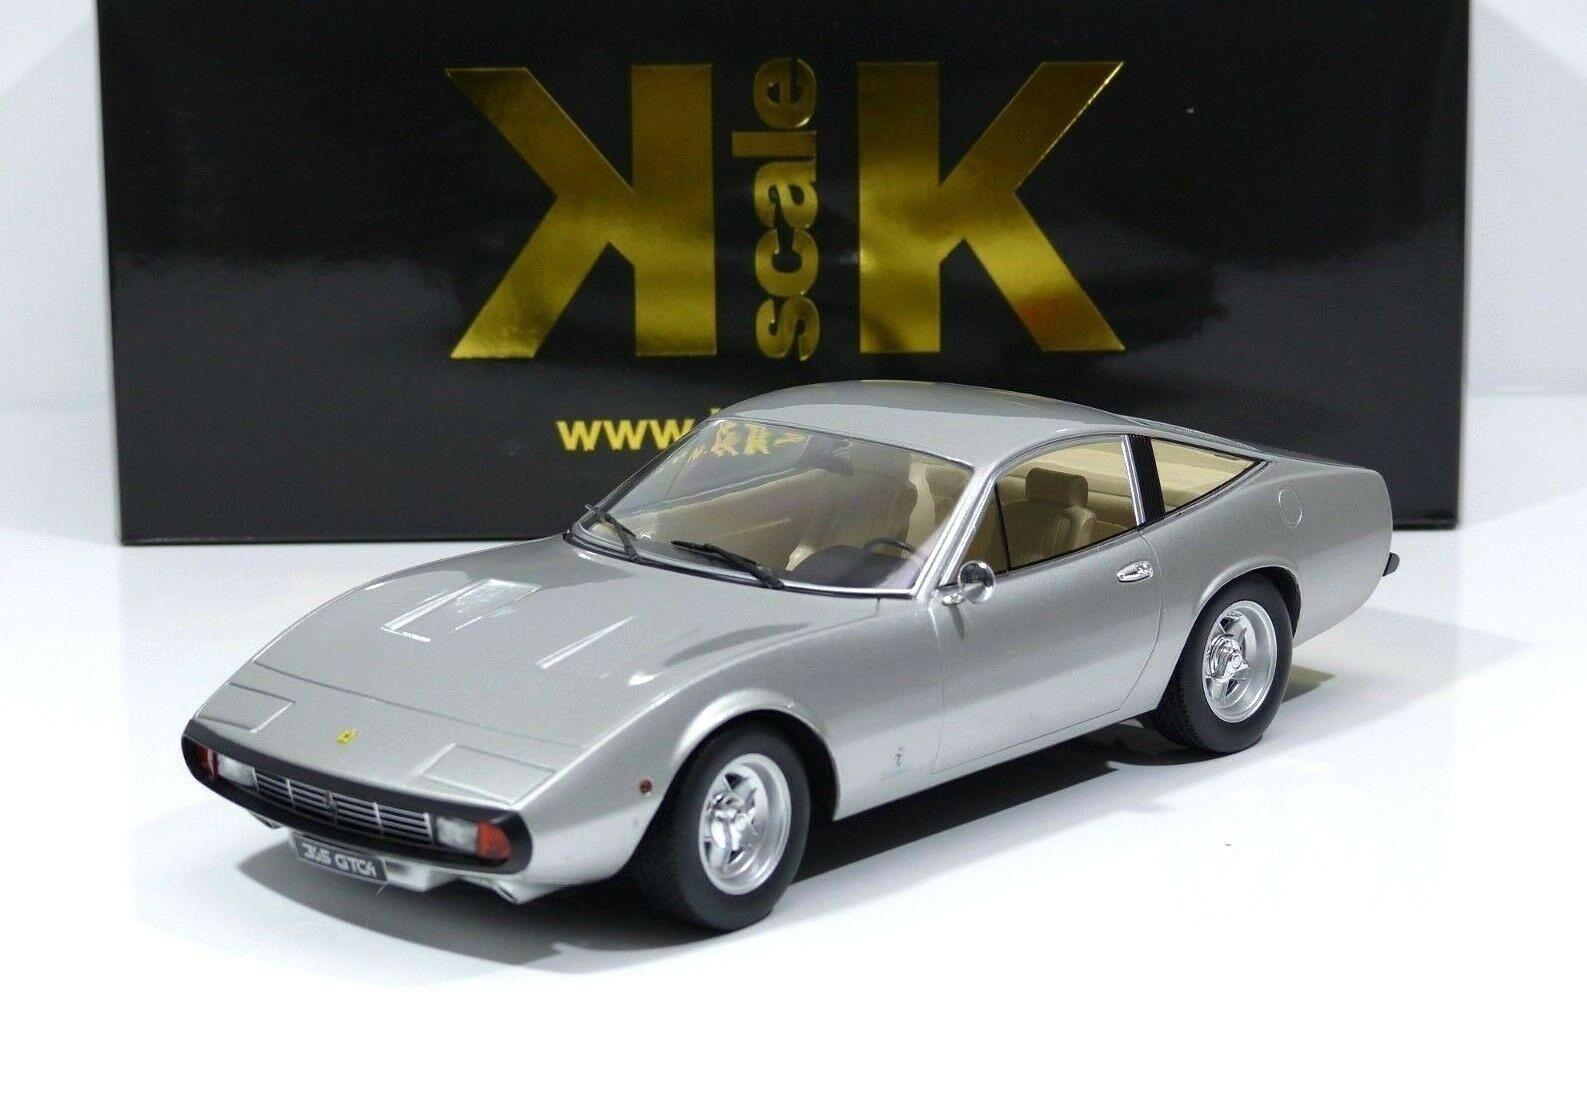 Ferrari 365 365 365 GTC 4 Baujahr 1971 silver KK-Scale KKDC180283 1 18 Neu   OVP 9cbe1a